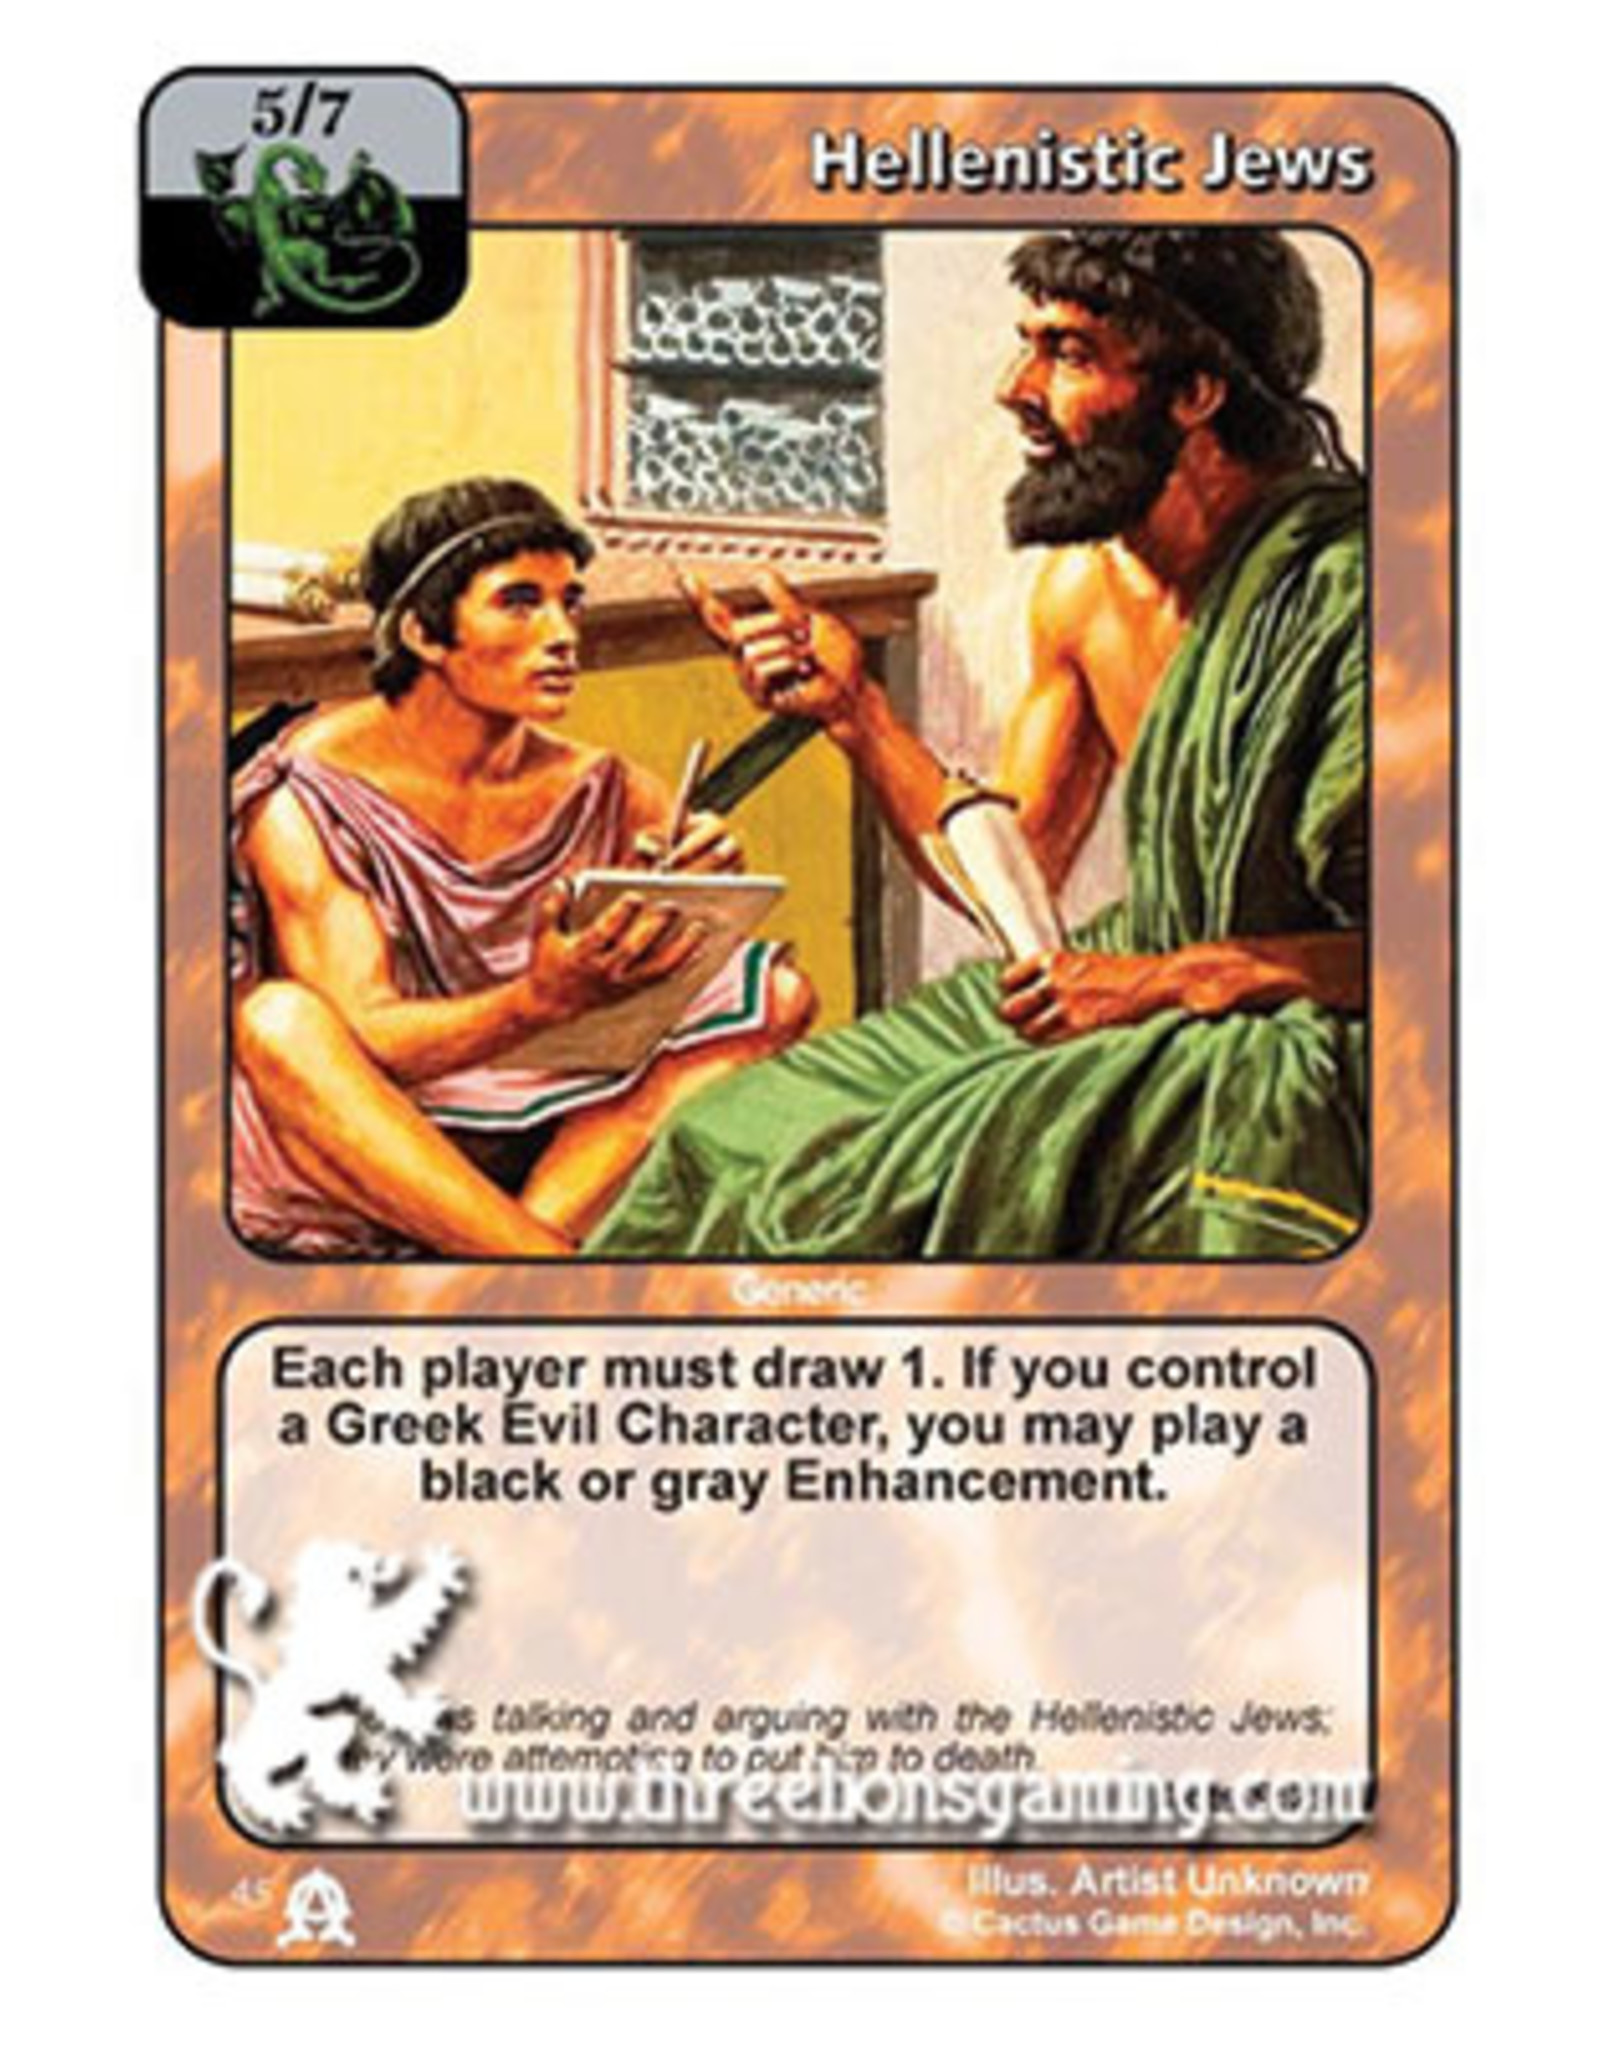 EC: Hellenistic Jews